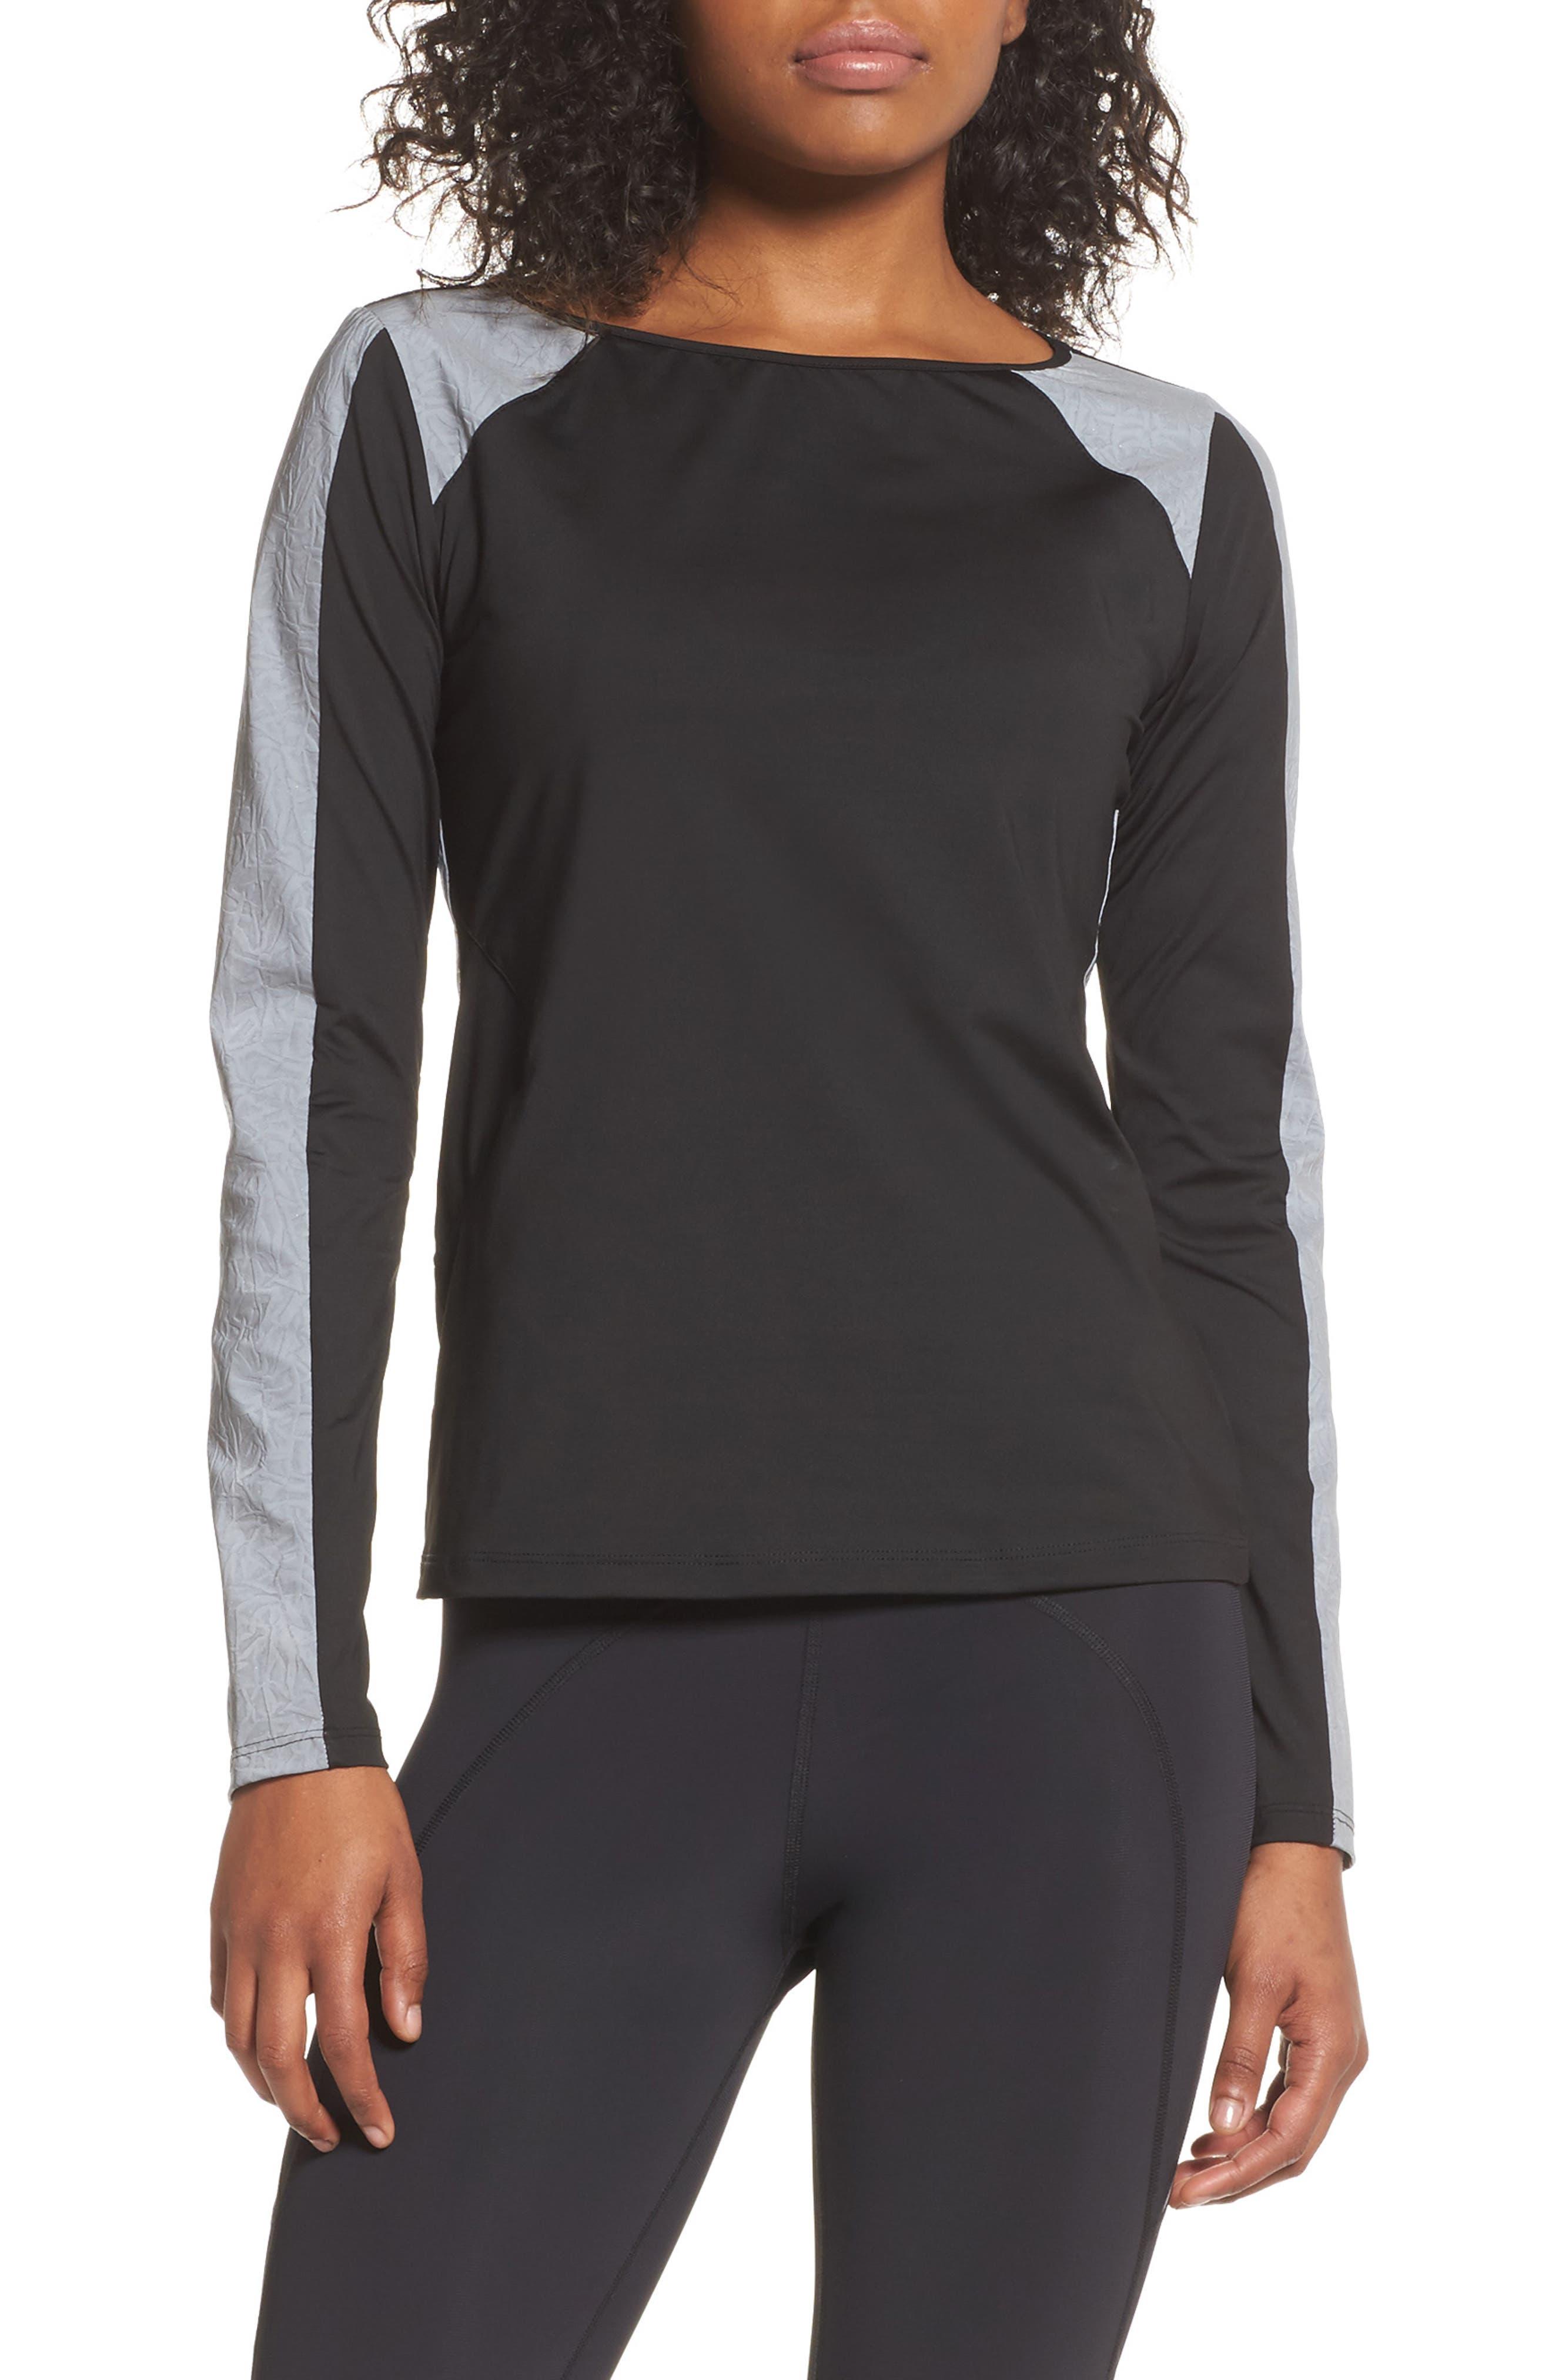 BoomBoom Athletica Reflective Body-Con Long Sleeve Tee,                             Main thumbnail 1, color,                             Black/Reflective